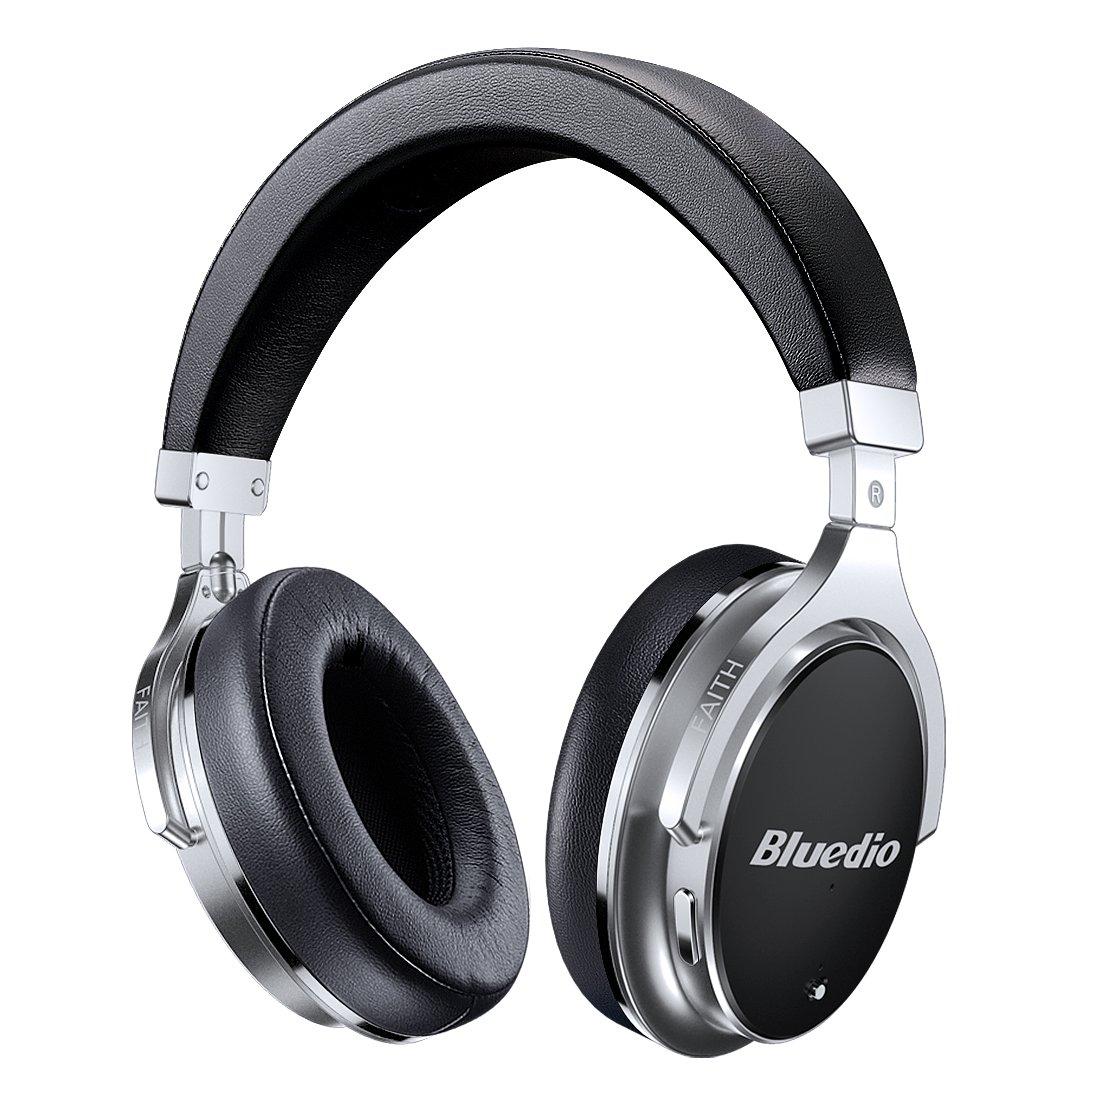 Bluetooth Headphones Active Noise Cancelling, Bluedio F2 ANC Over Ear Wireless Headphones 180° Rotation,Wired and Wireless Headphones for Cell Phone/TV/ PC - Black